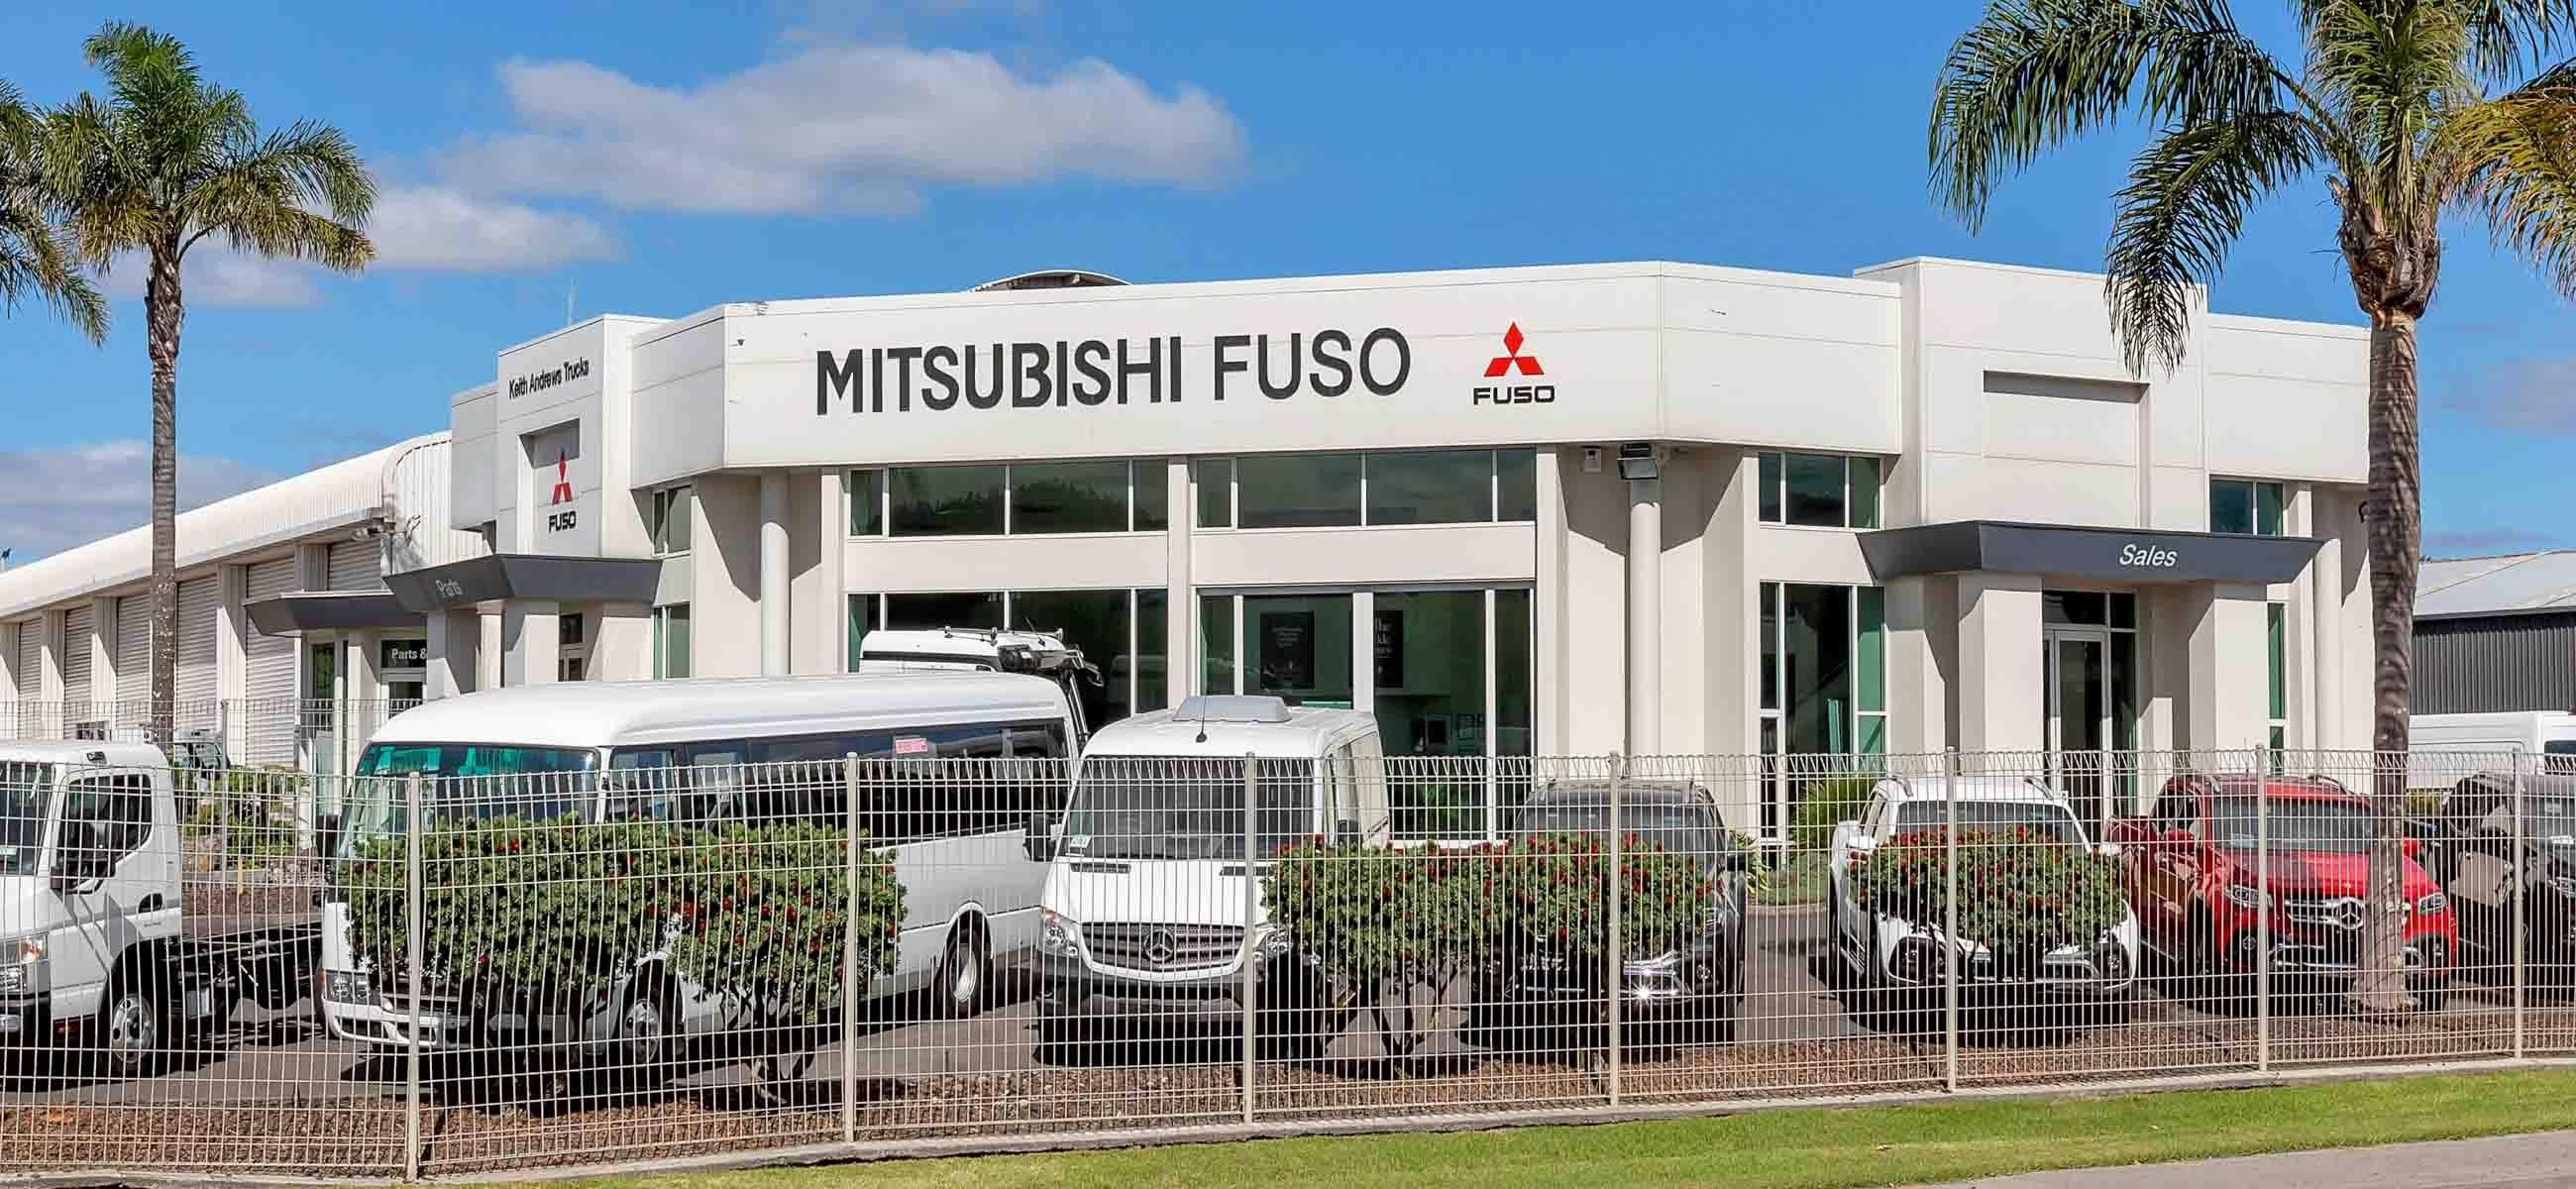 steel building construction company, steel retail building, mitsubishi fuso building